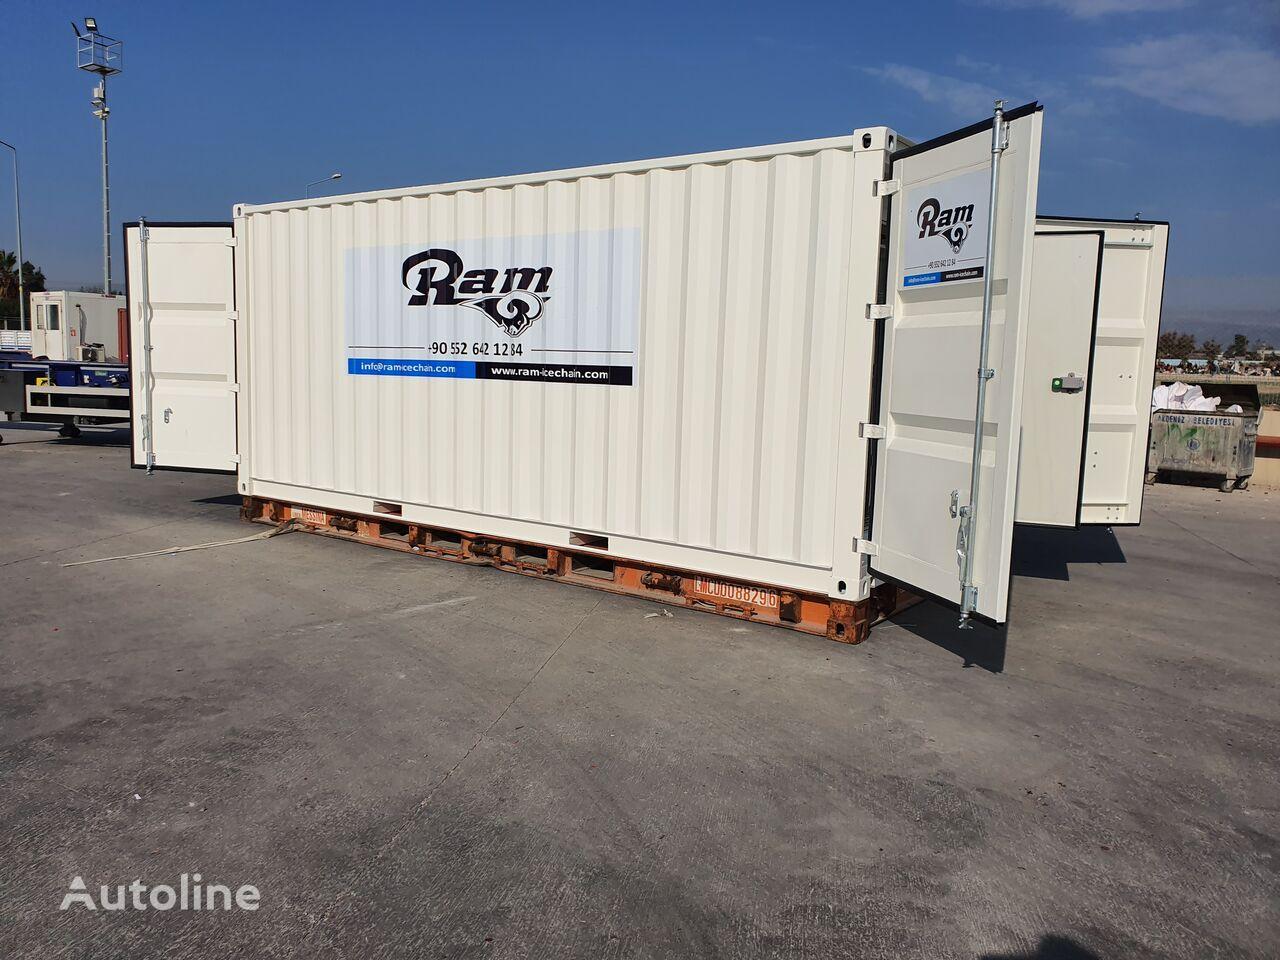 Ram Container Cooling Box 20 Feet and 40 Feet - RAM-ICECHAN camión frigorífico < 3.5t nuevo